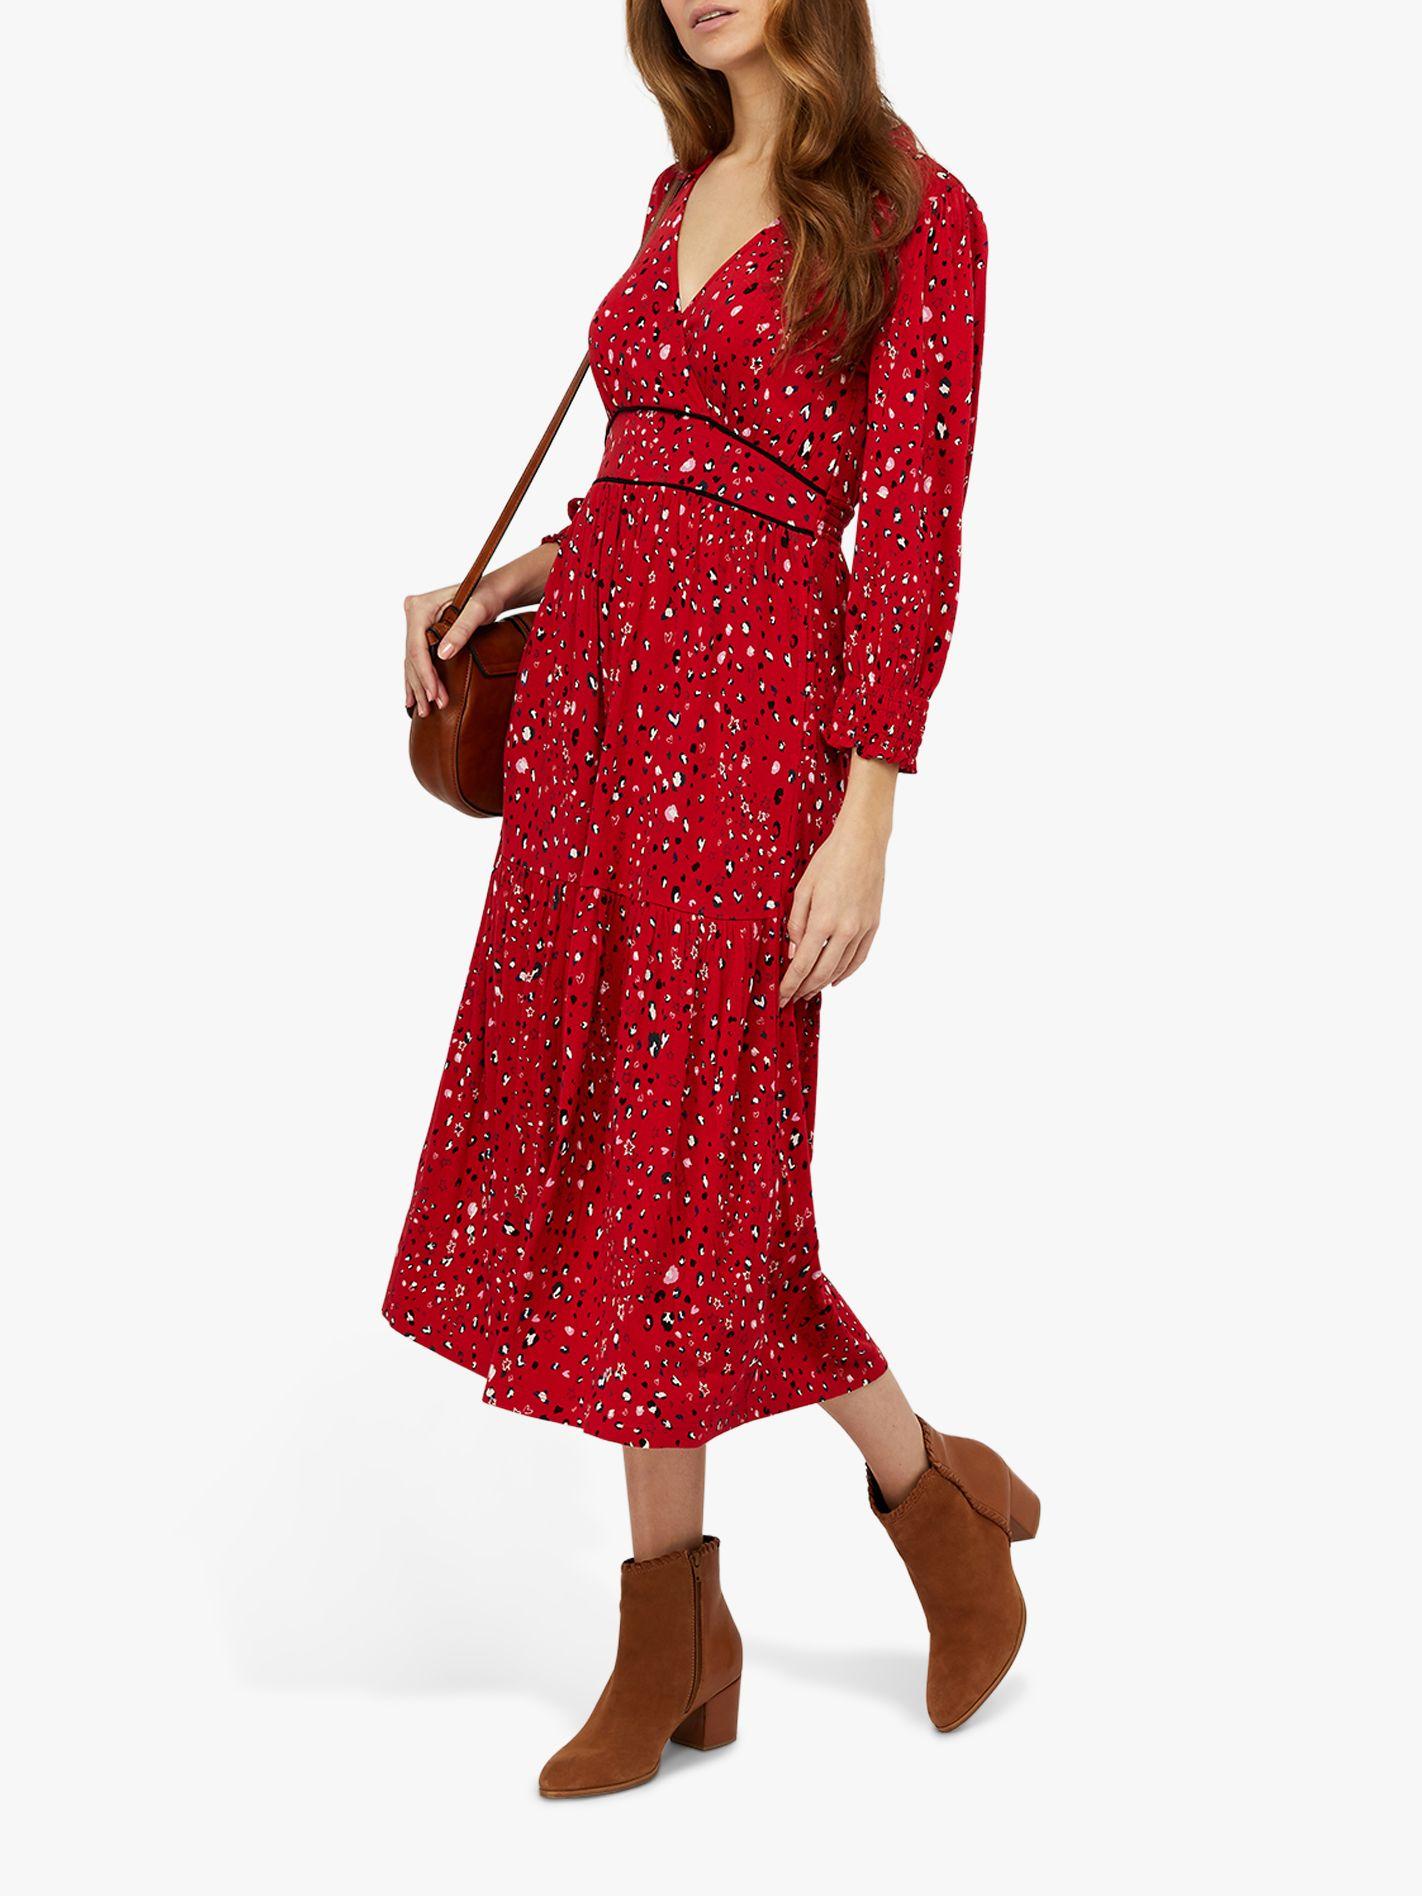 Monsoon Monsoon Star Print Midi Dress, Red